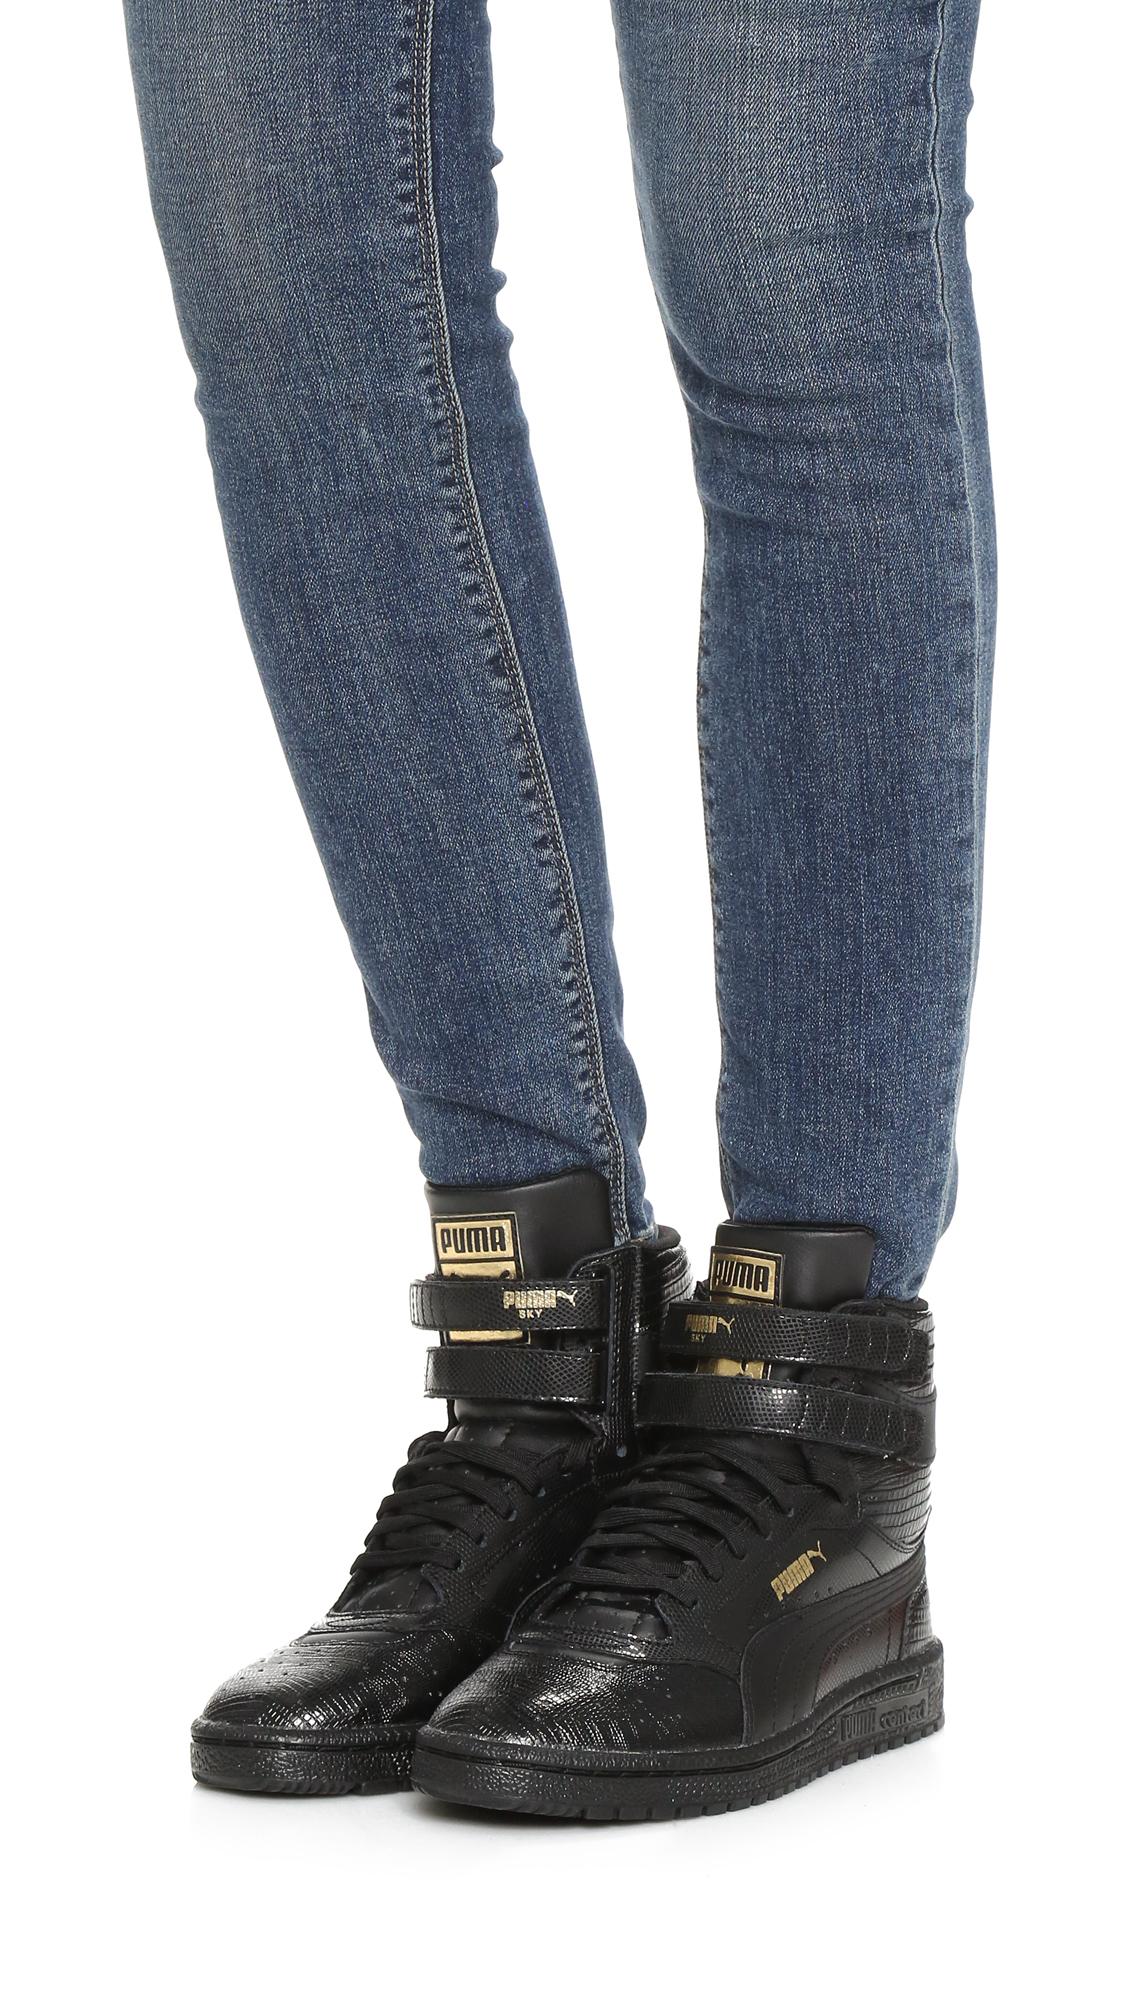 4223b7b22138c2 PUMA Sky Ii High Top Sneakers in Black - Lyst